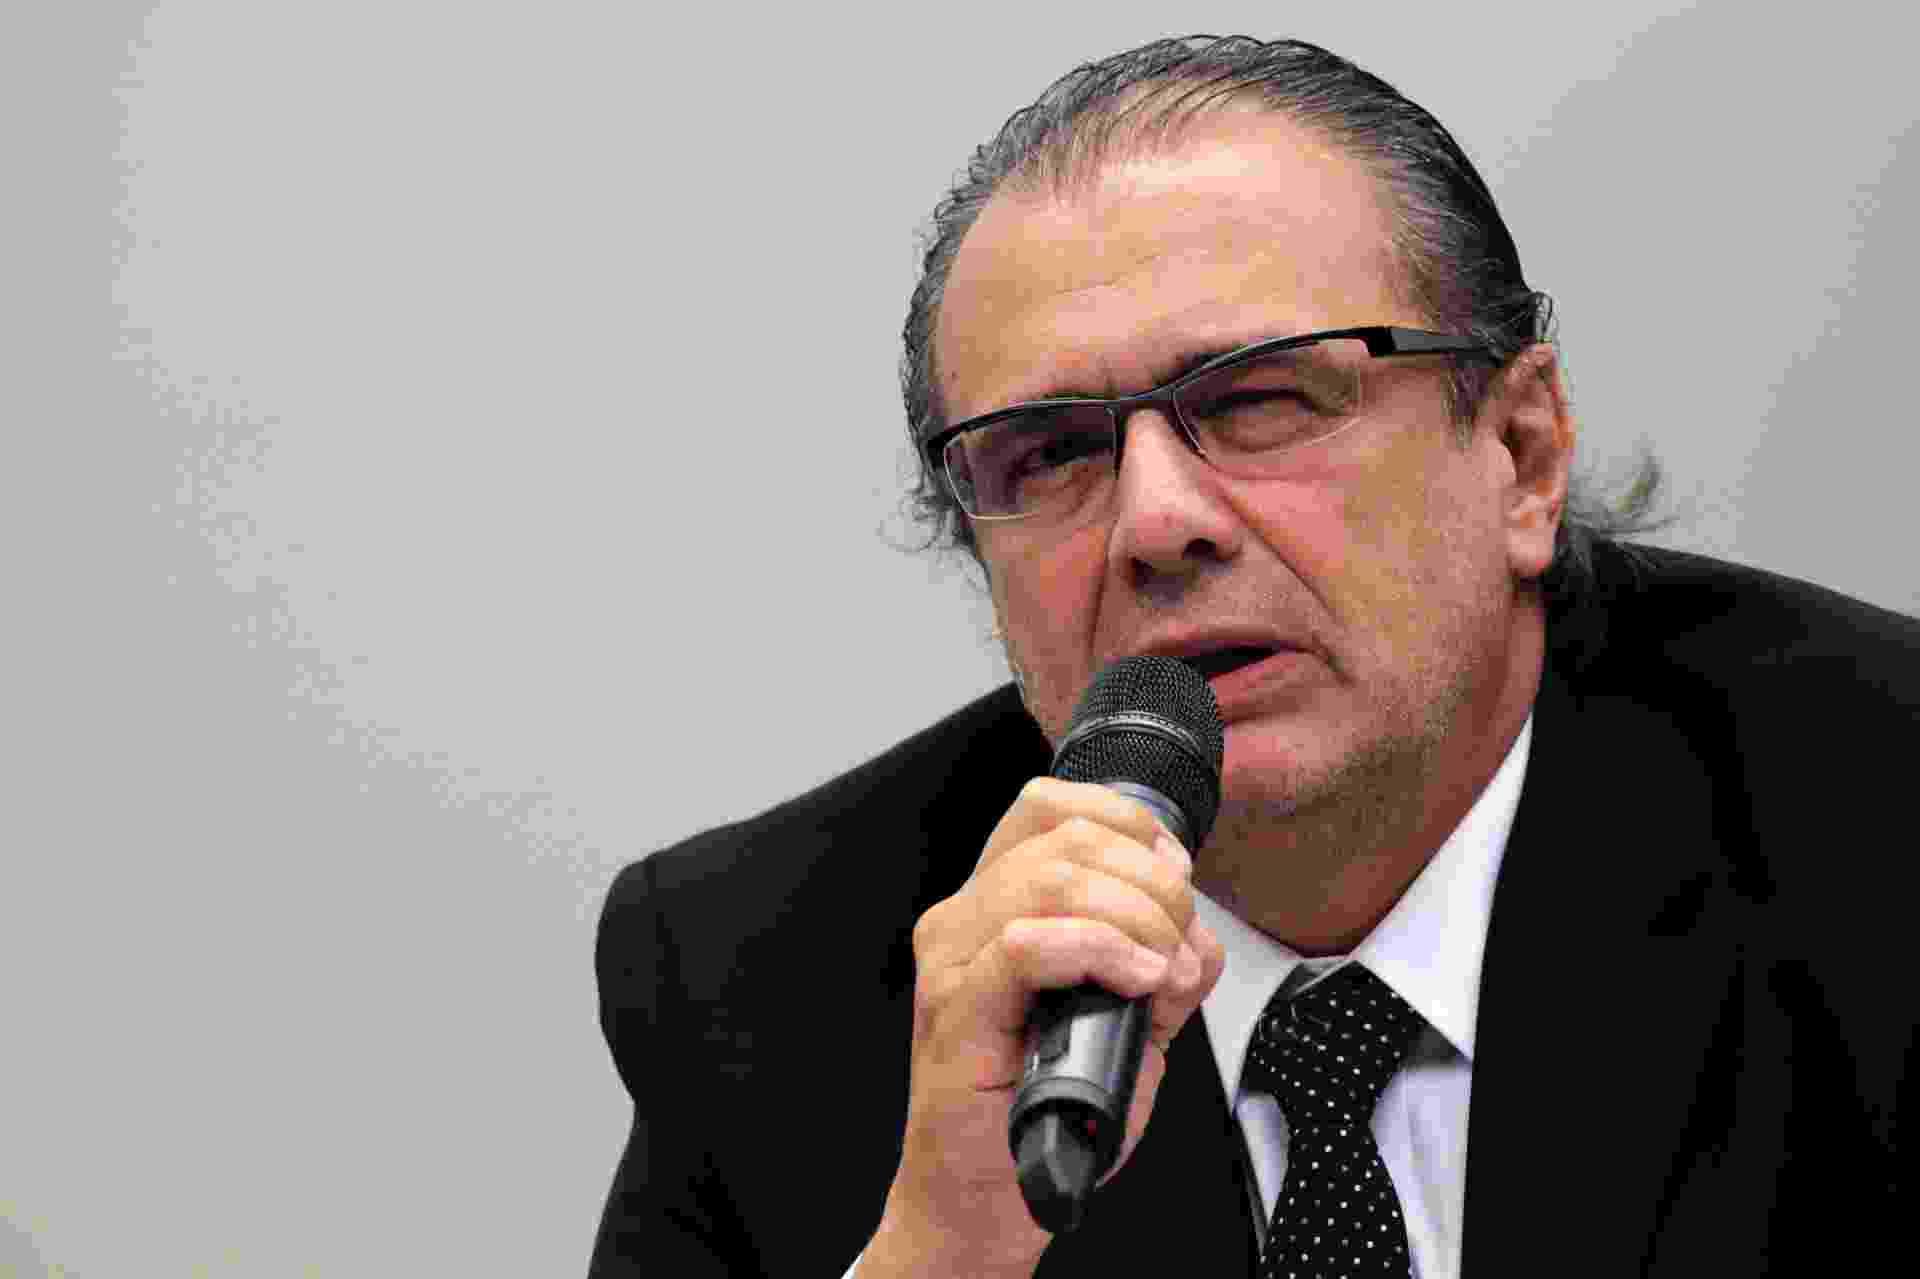 Pedro Barusco, ex-gerente da Petrobras - UESLEI MARCELINO/REUTERS